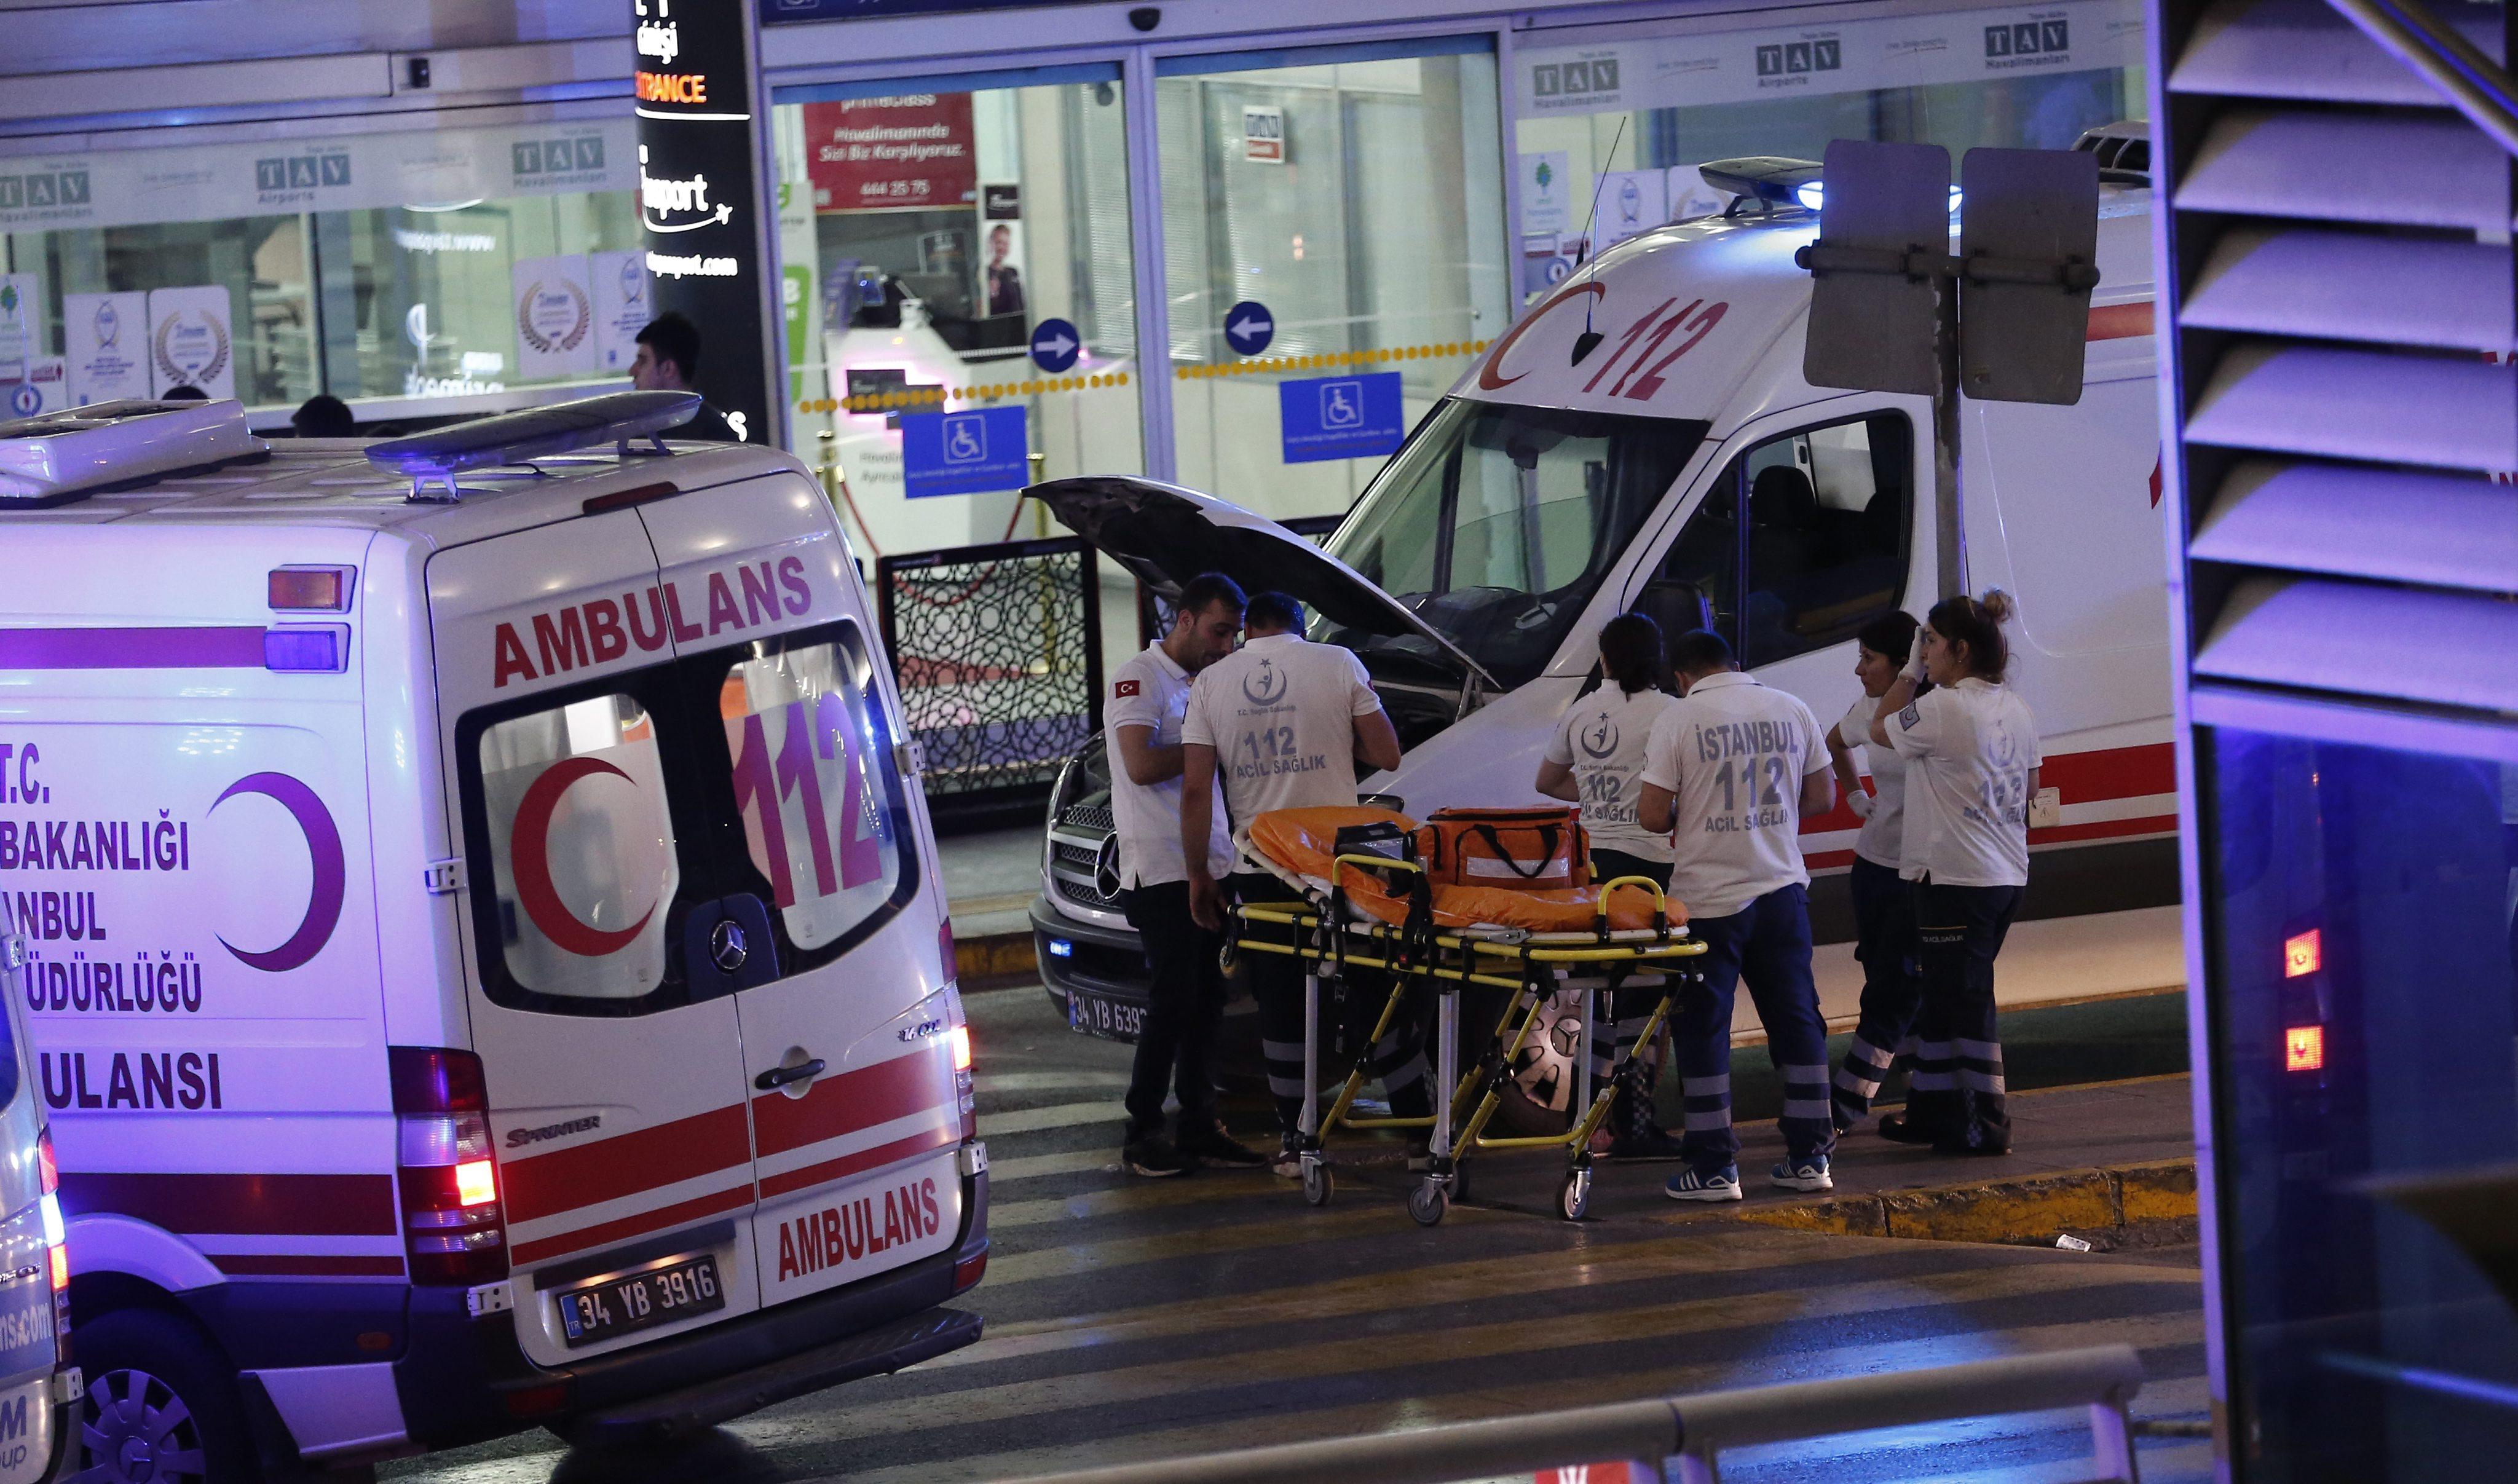 �stanbul Atat�rk Havaliman�'nda canl� bomba patlad�: 10 �ehit, 60 yaral�